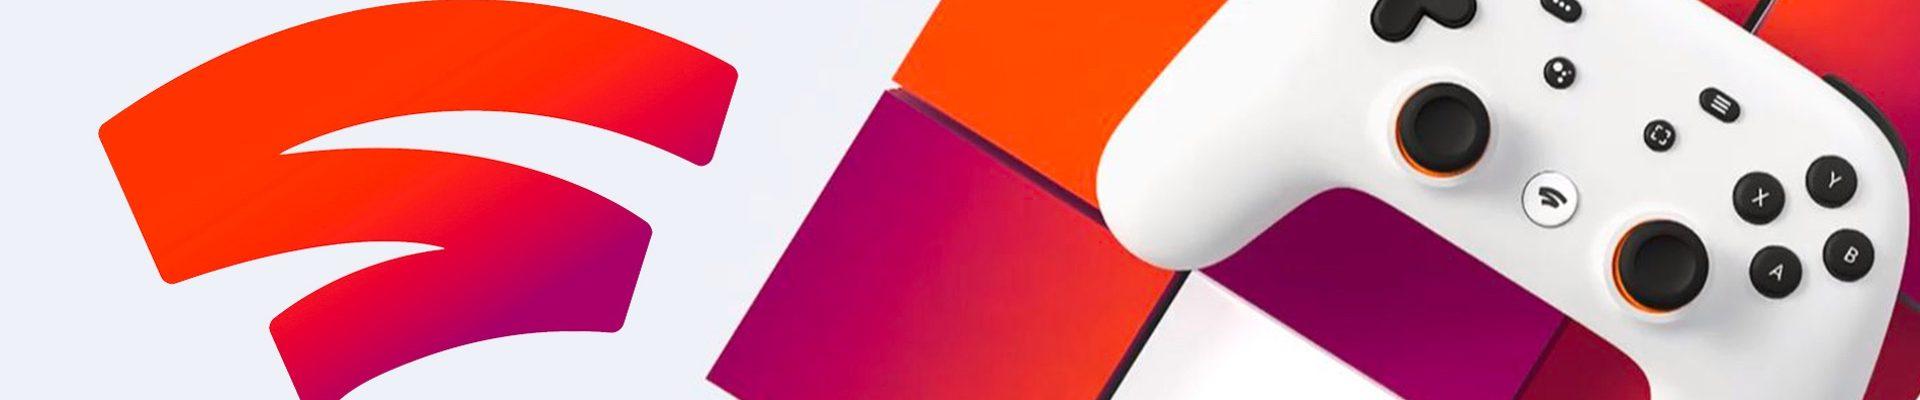 Google Stadia launch details